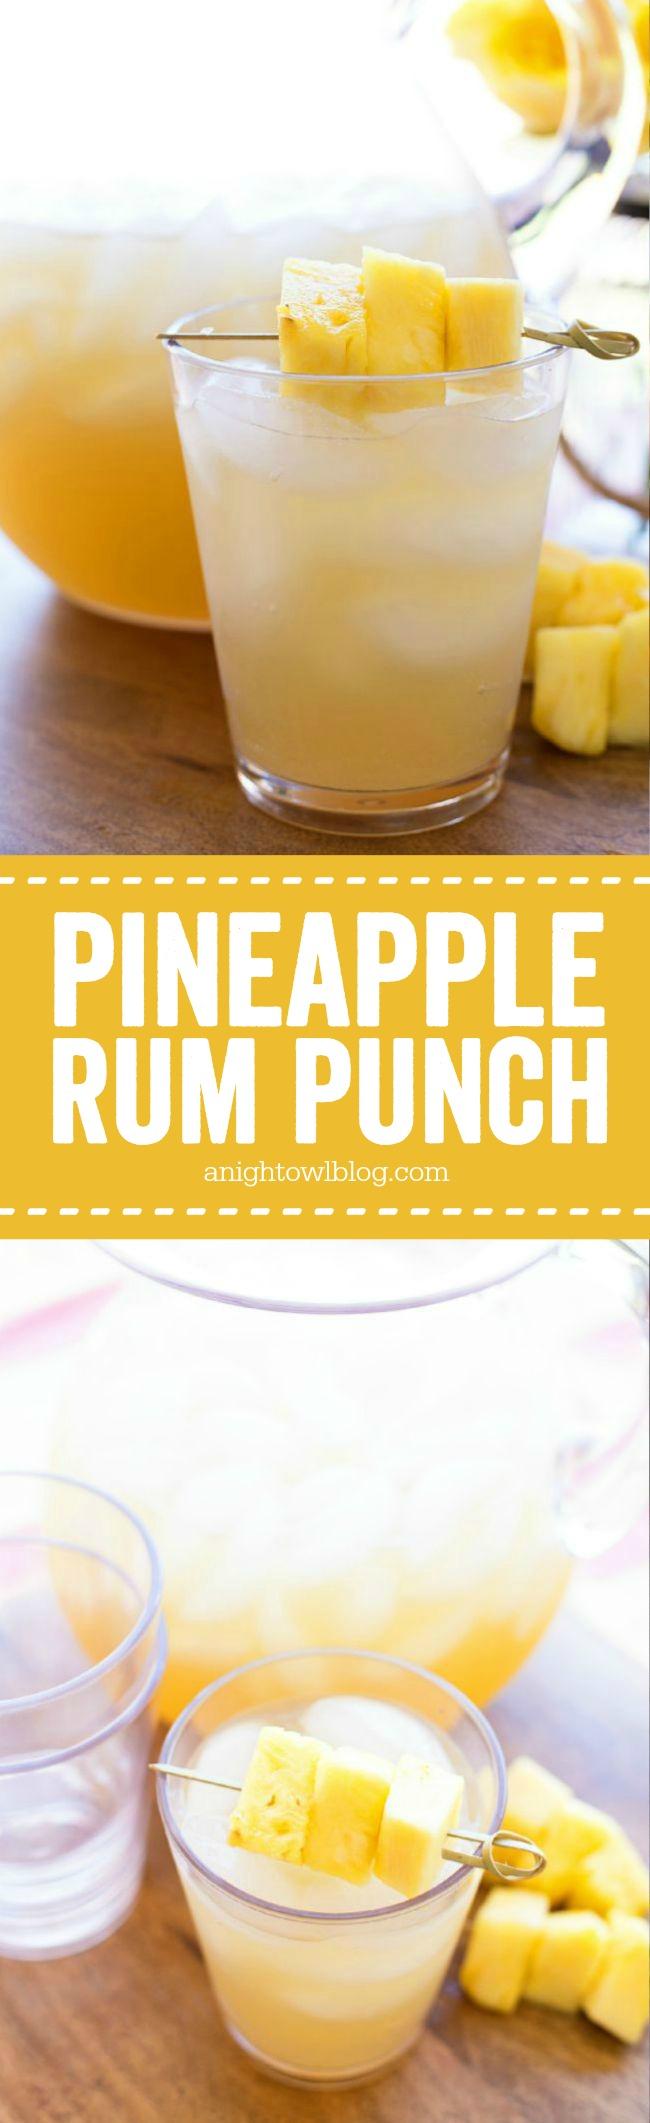 pineapple rum punch | a night owl blog